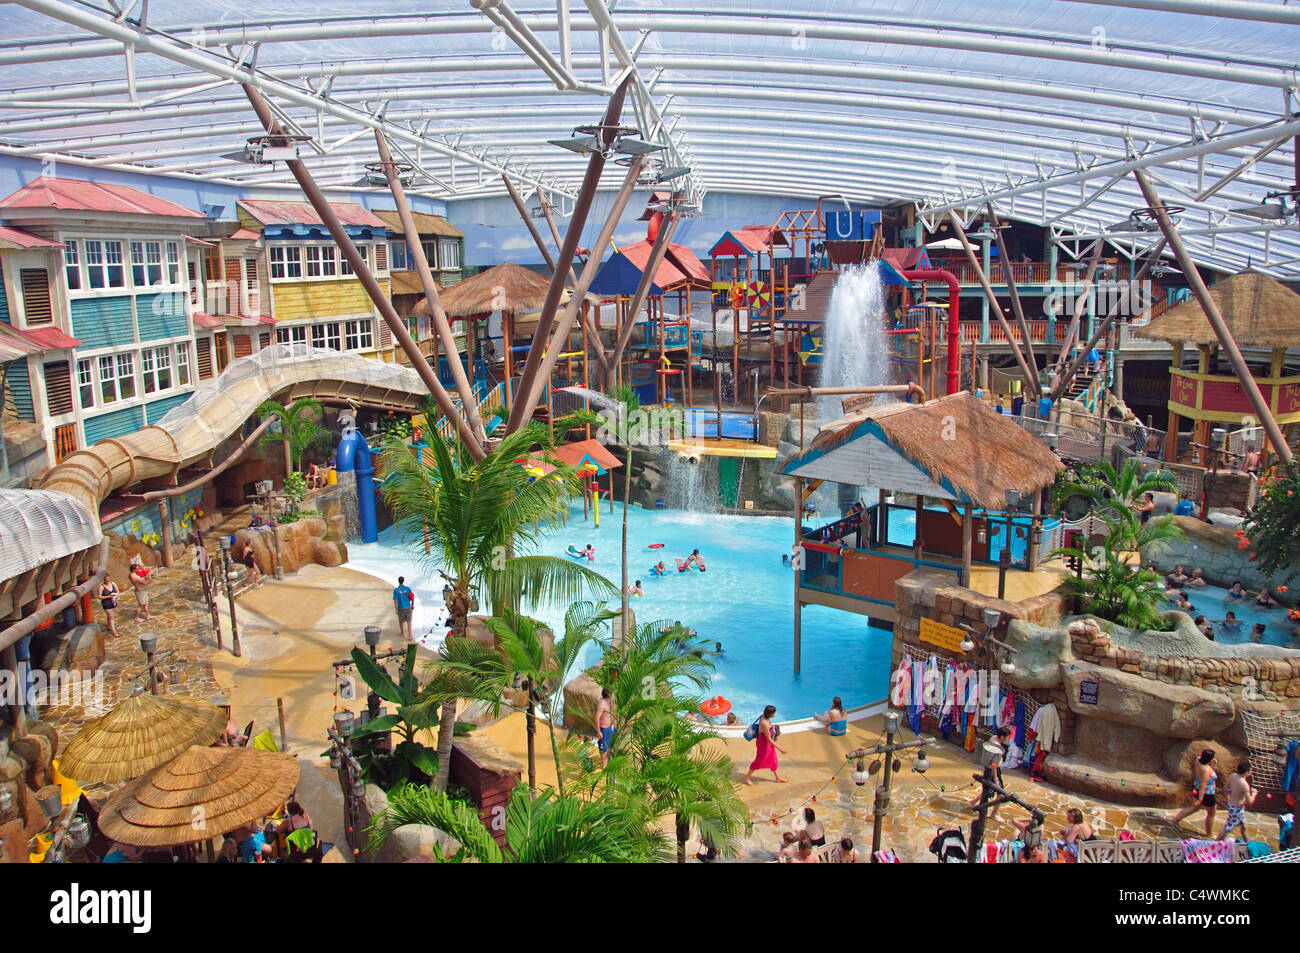 Alton Towers Waterpark At Splash Landings Hotel Alton Towers Theme Stock Photo 37444384 Alamy